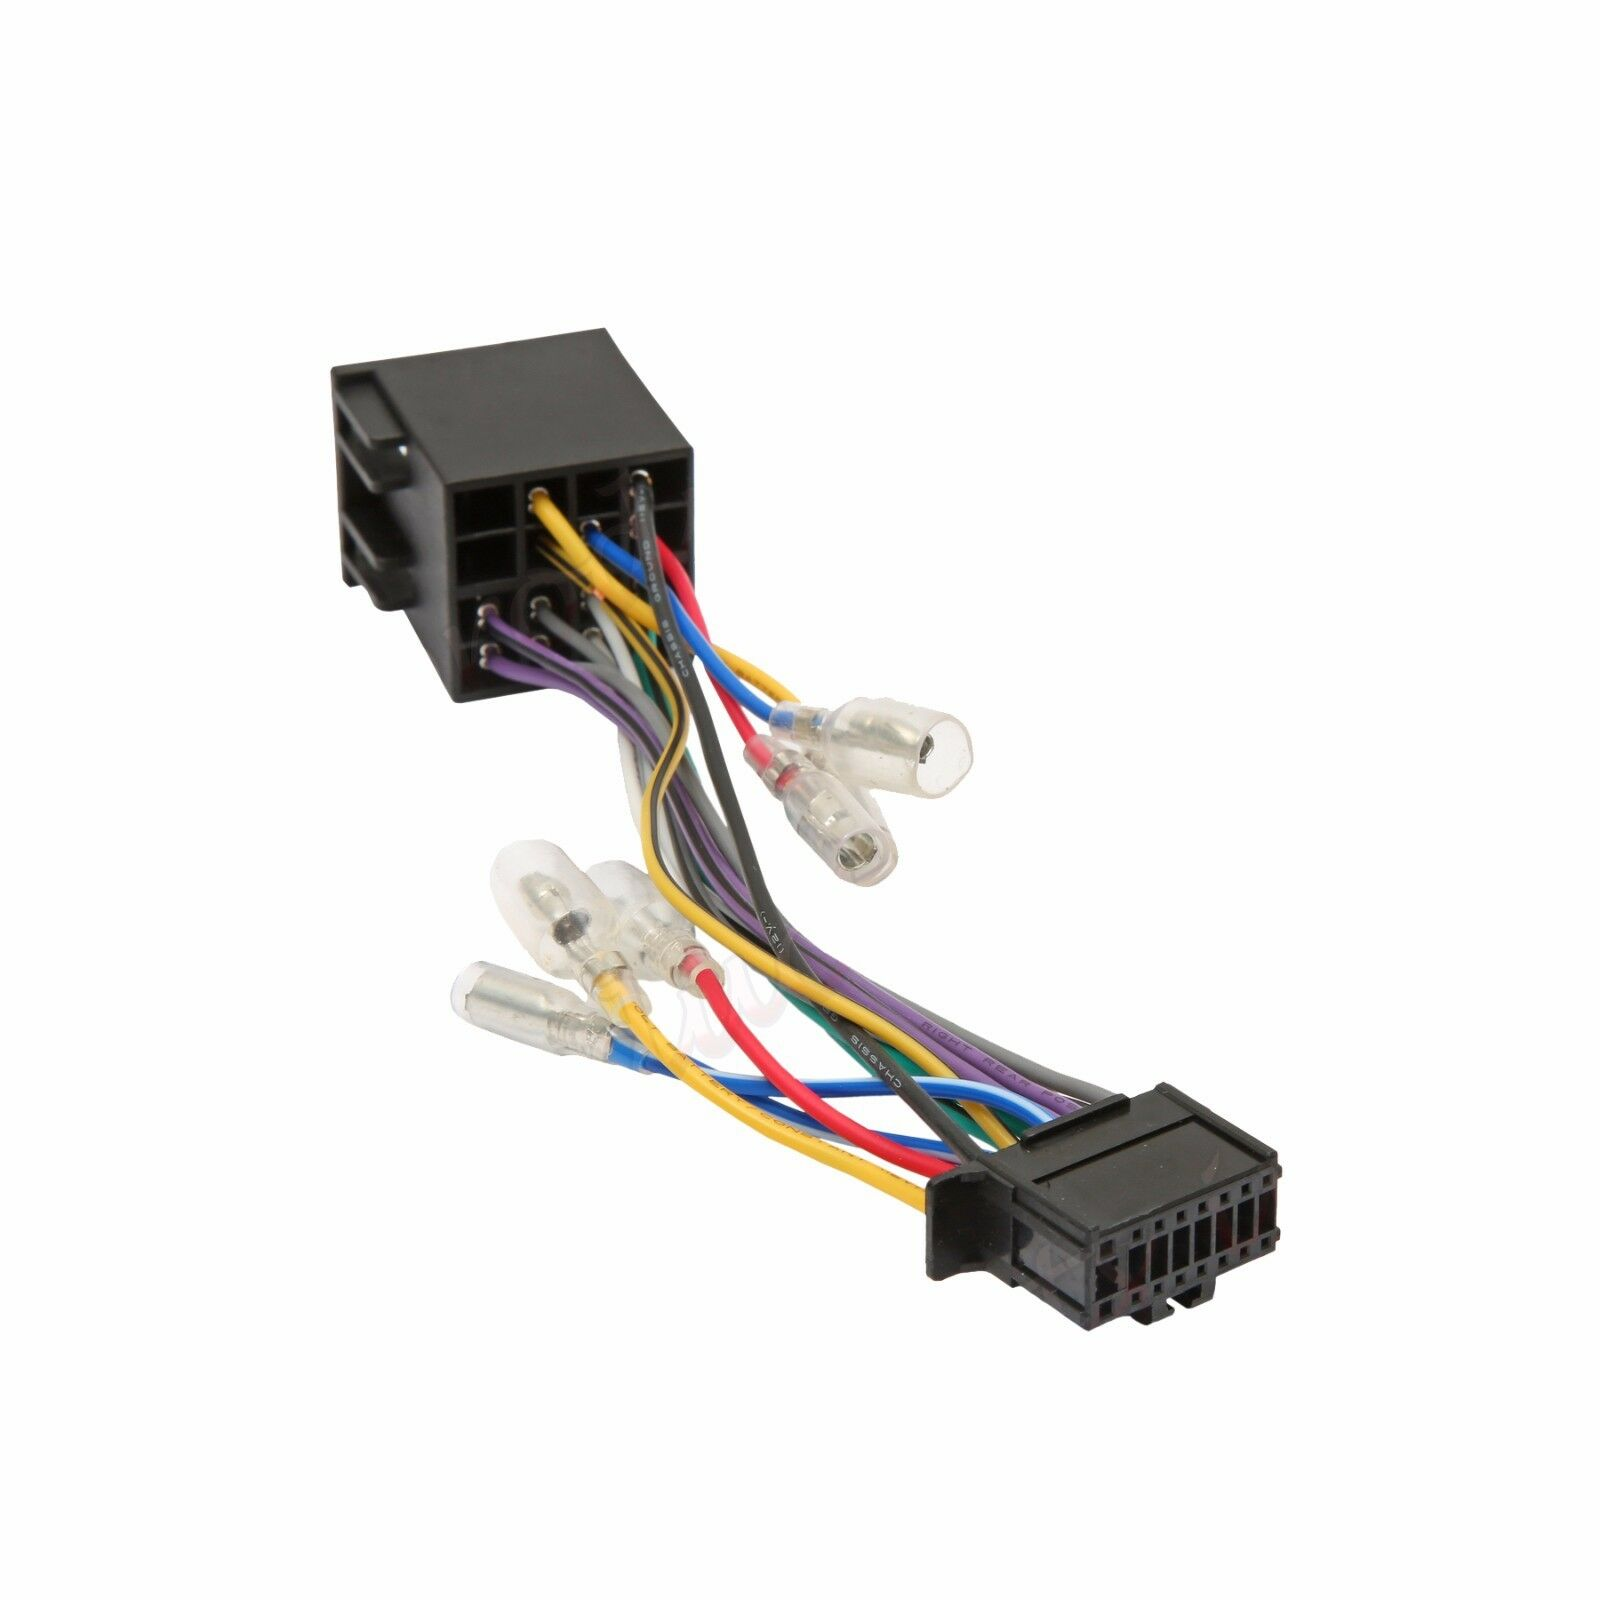 pioneer 16 pin iso wiring harness connector adaptor car stereo radio rh ebay co uk